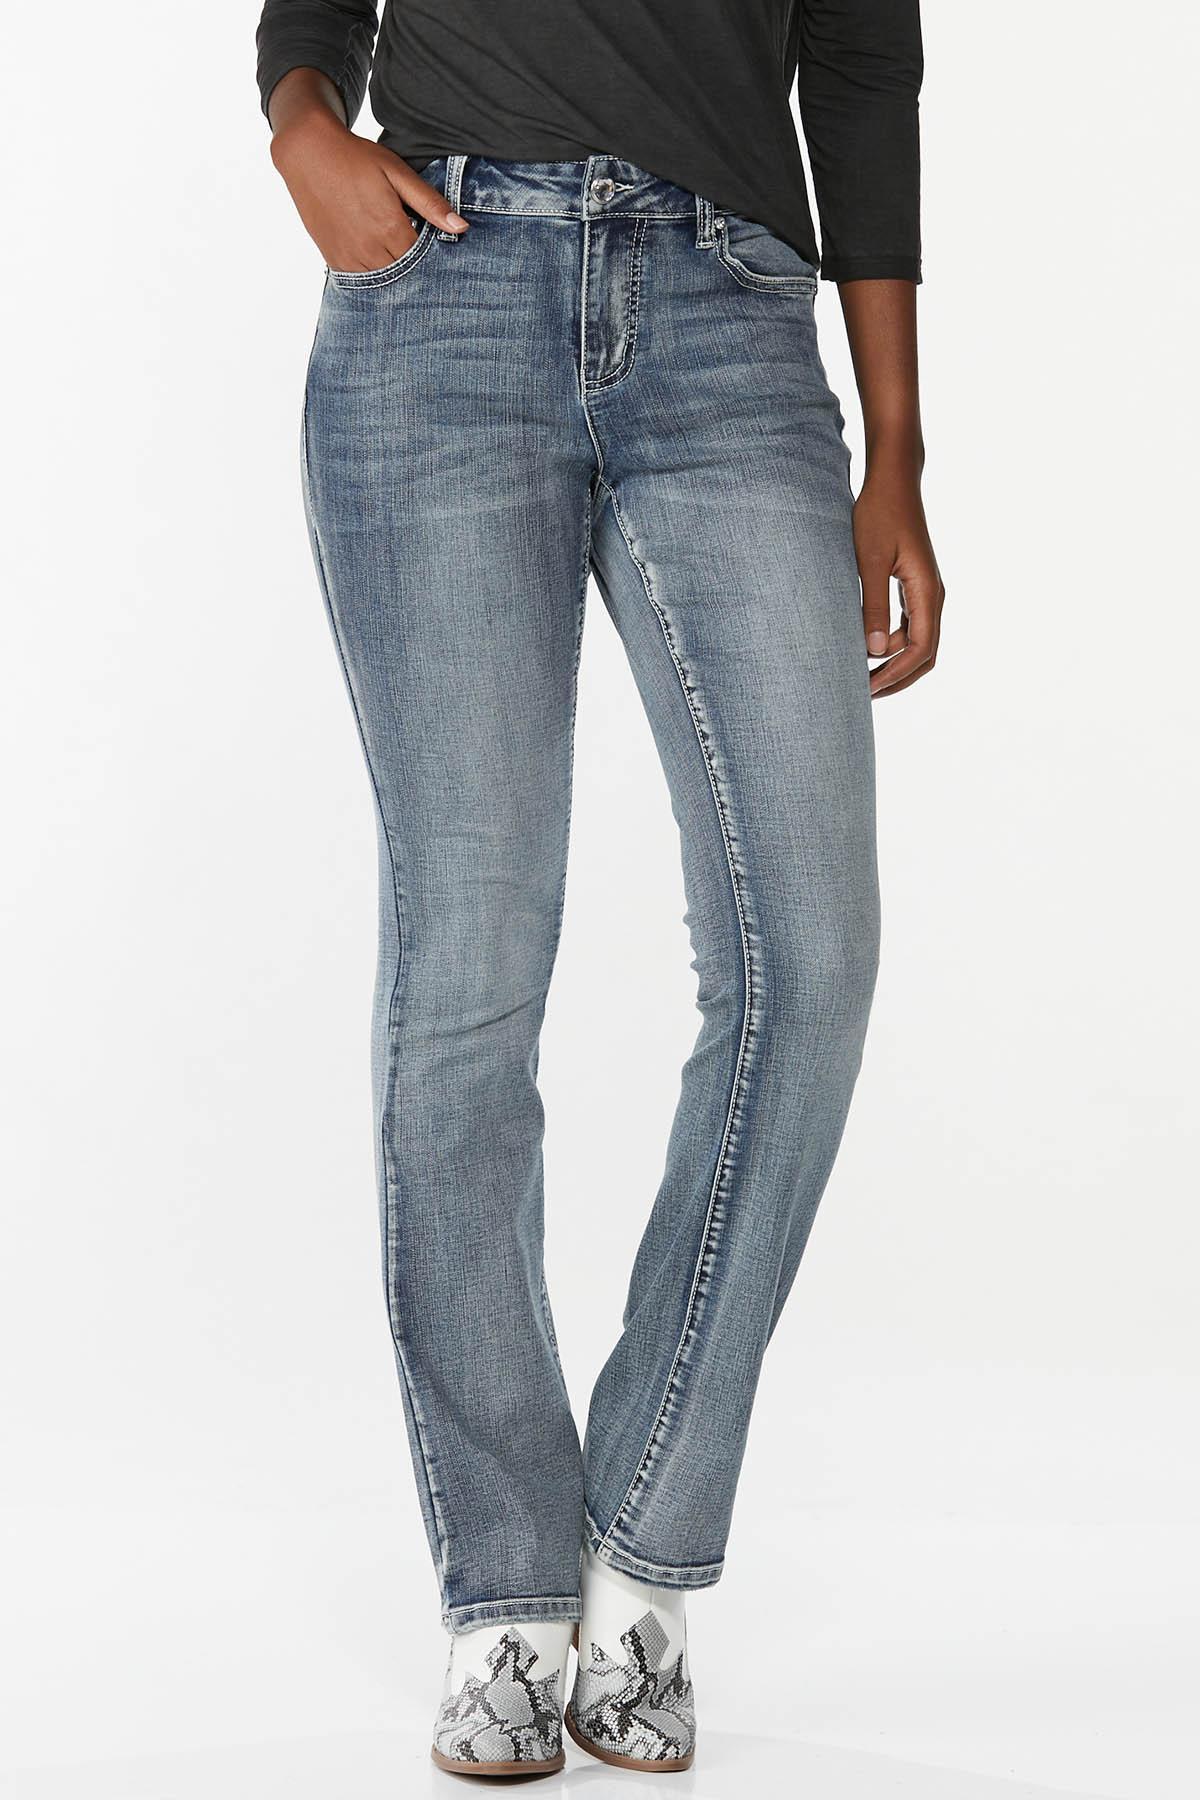 Petite Embellished Curvy Jeans (Item #44726417)